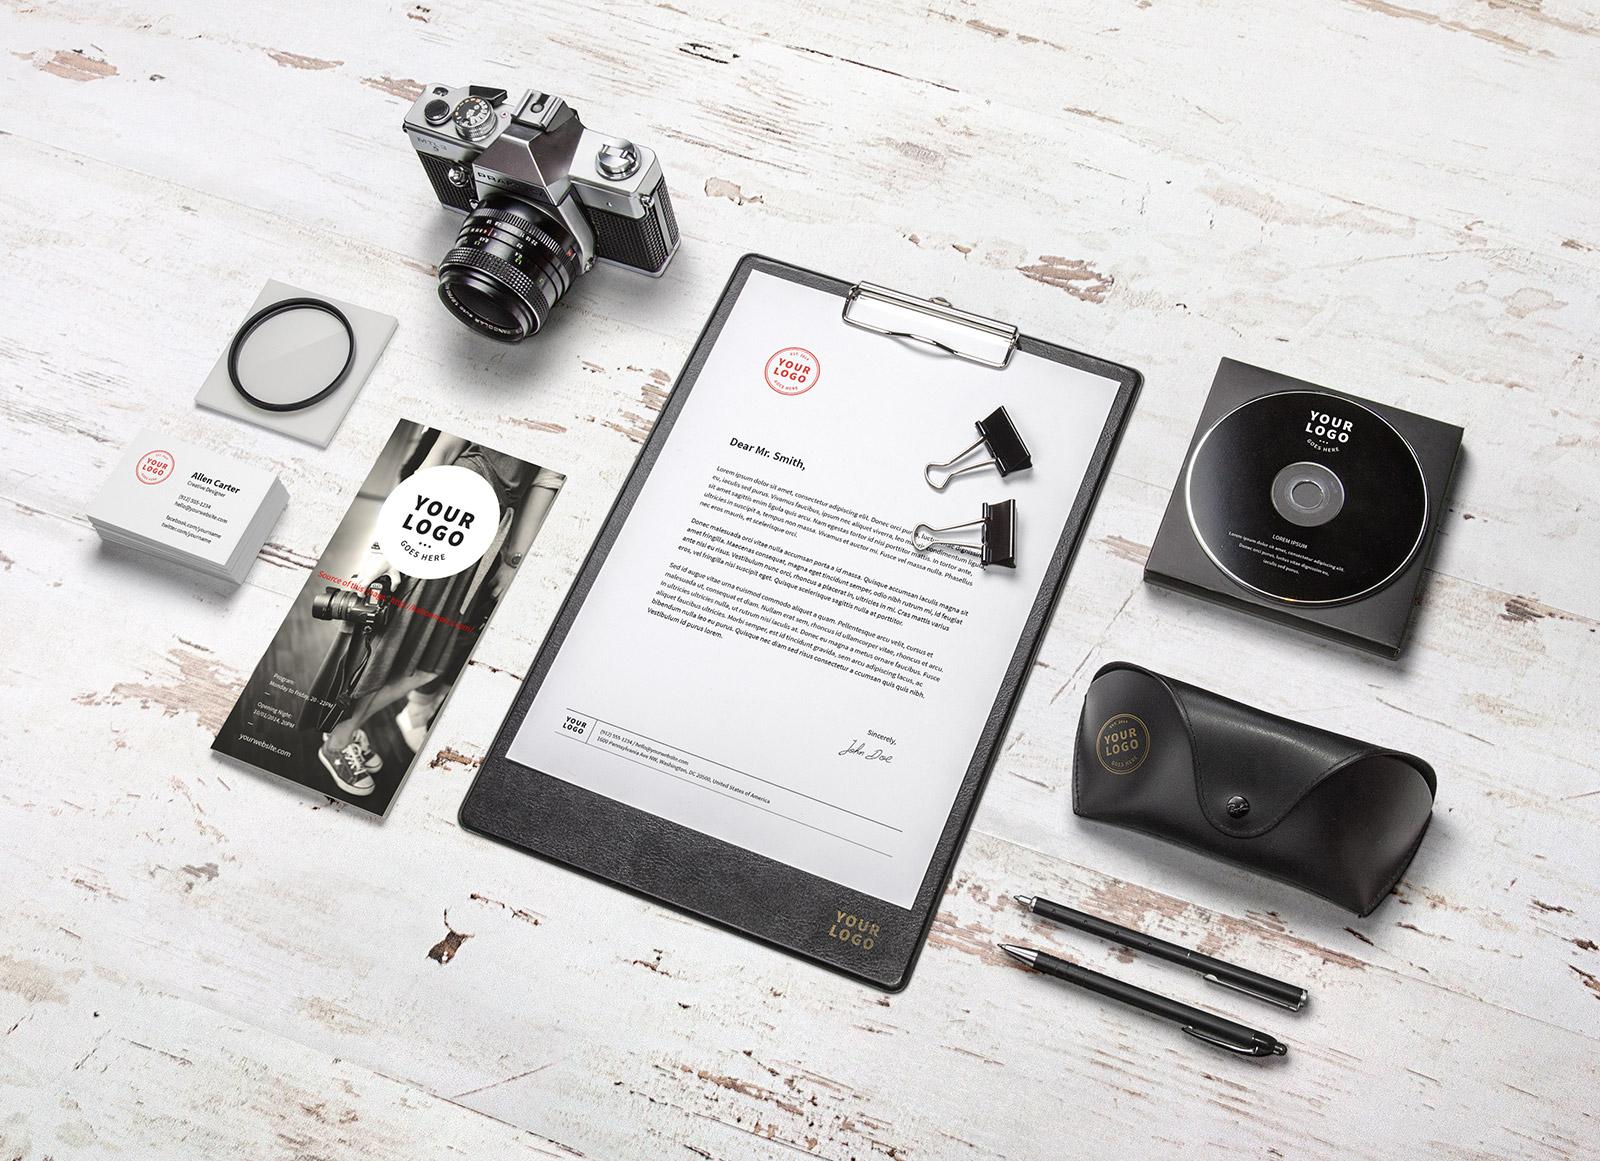 Free-Branding-Corporate-Idenity-Mockup-PSD-for-Photographers-2